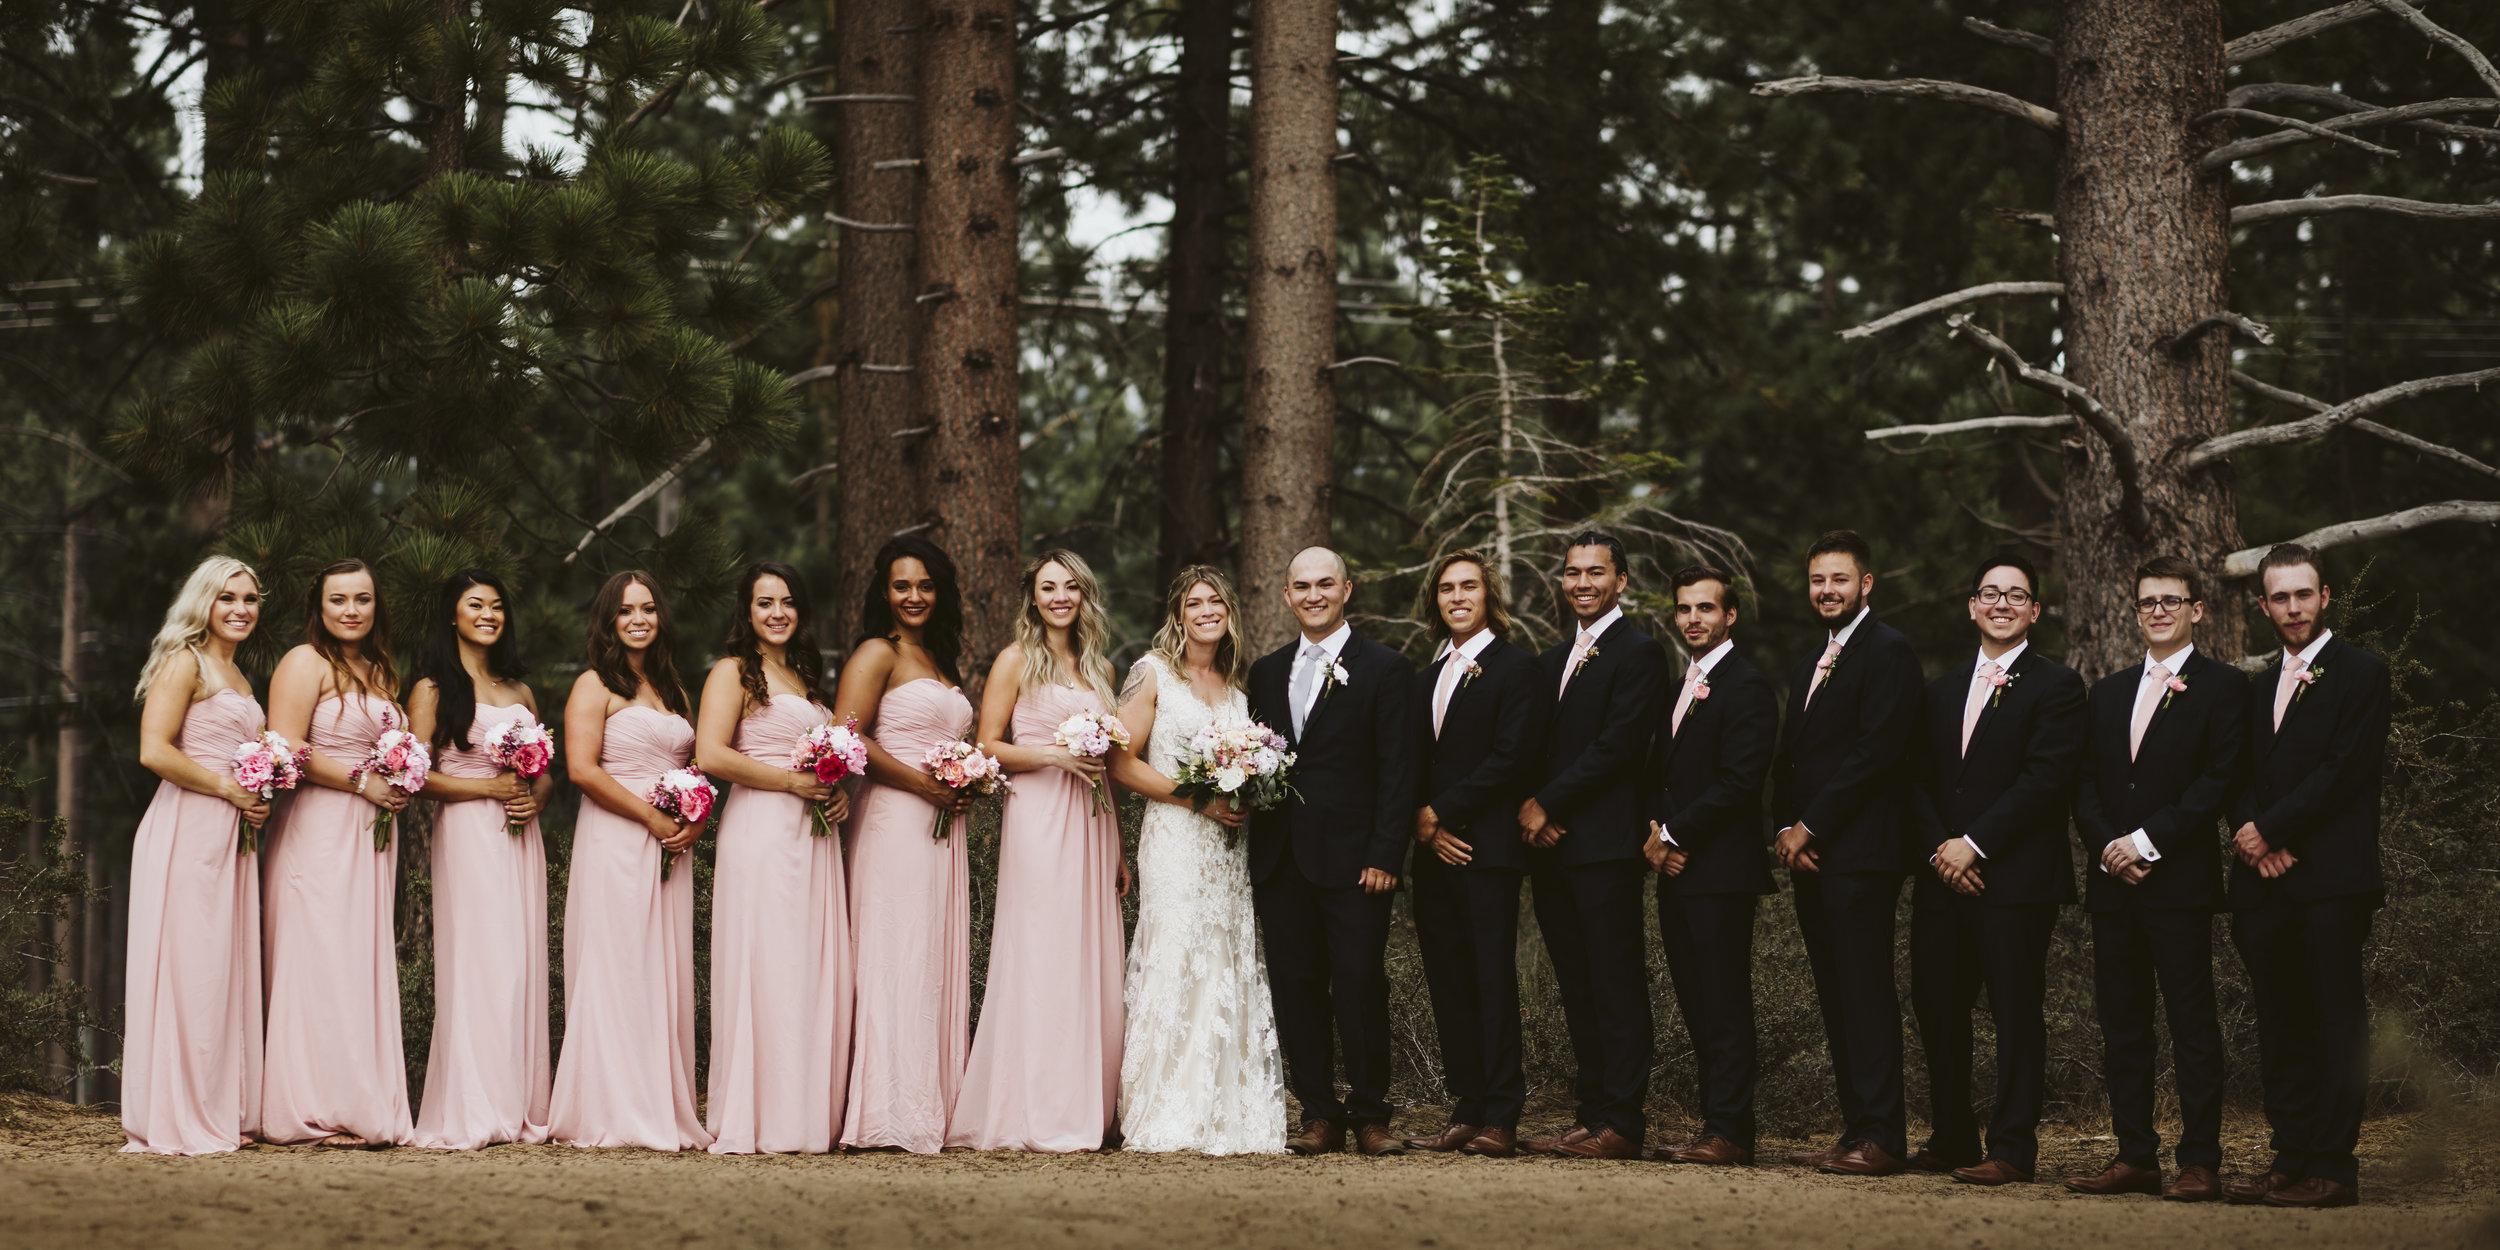 _P8A4347vild-vild photography-photography-wedding-wedding photography-tahoe-lake tahoe-lake tahoe wedding photographer-nevada wedding photographer-mountain wedding.jpg